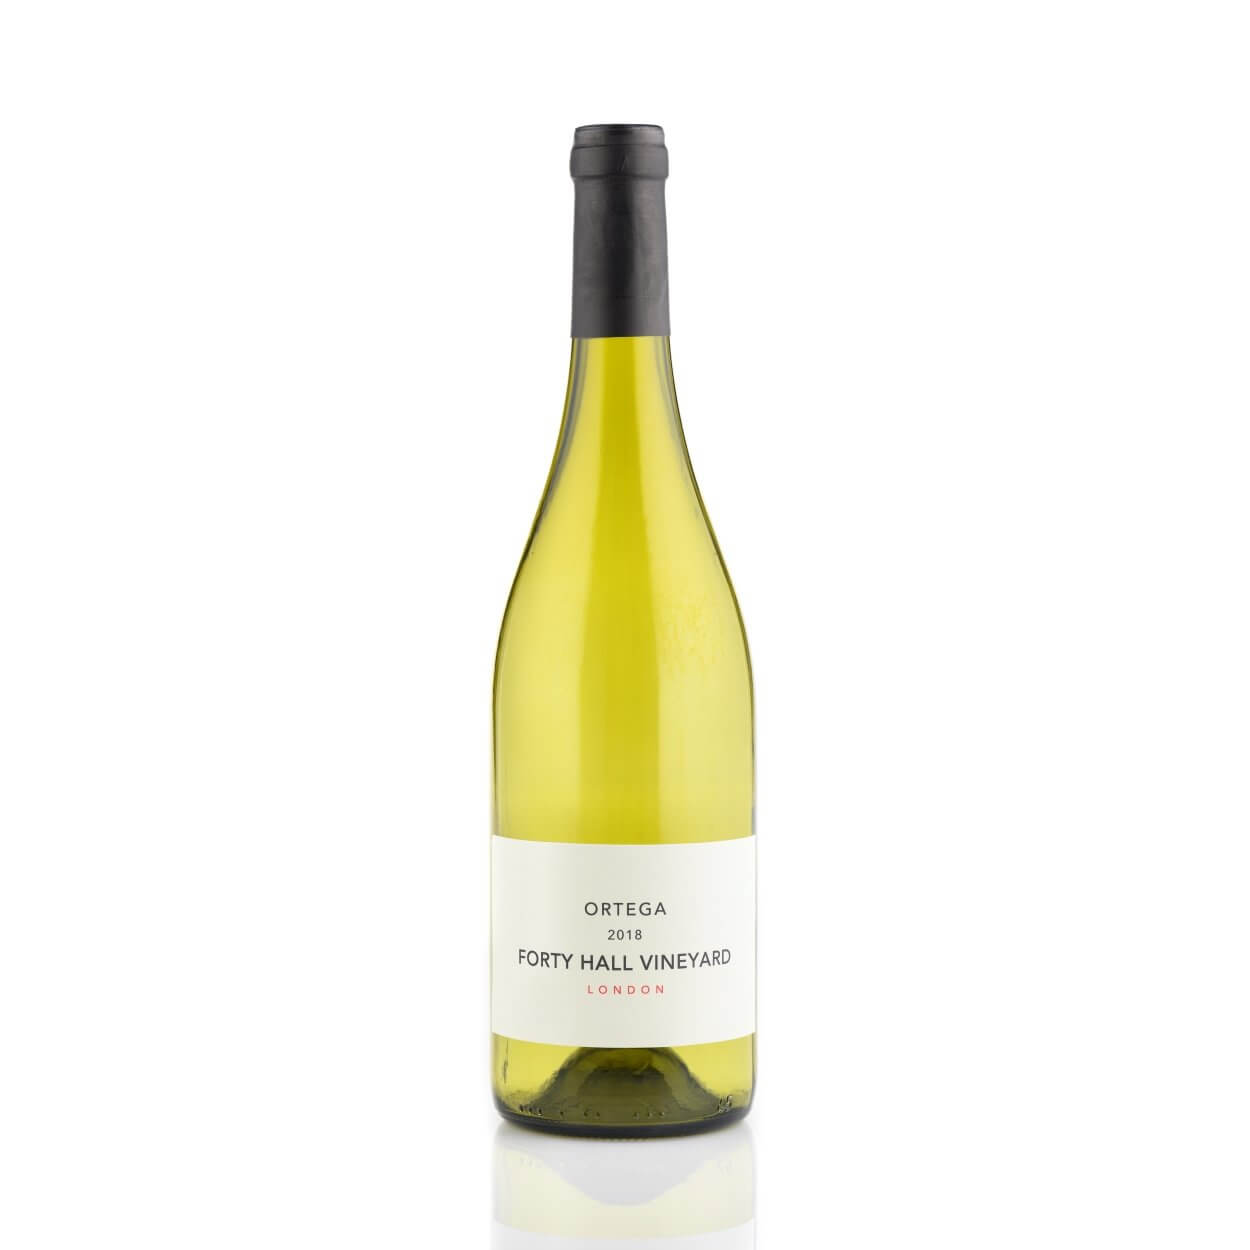 Forty Hall Vineyard Ortega 2018 English wine